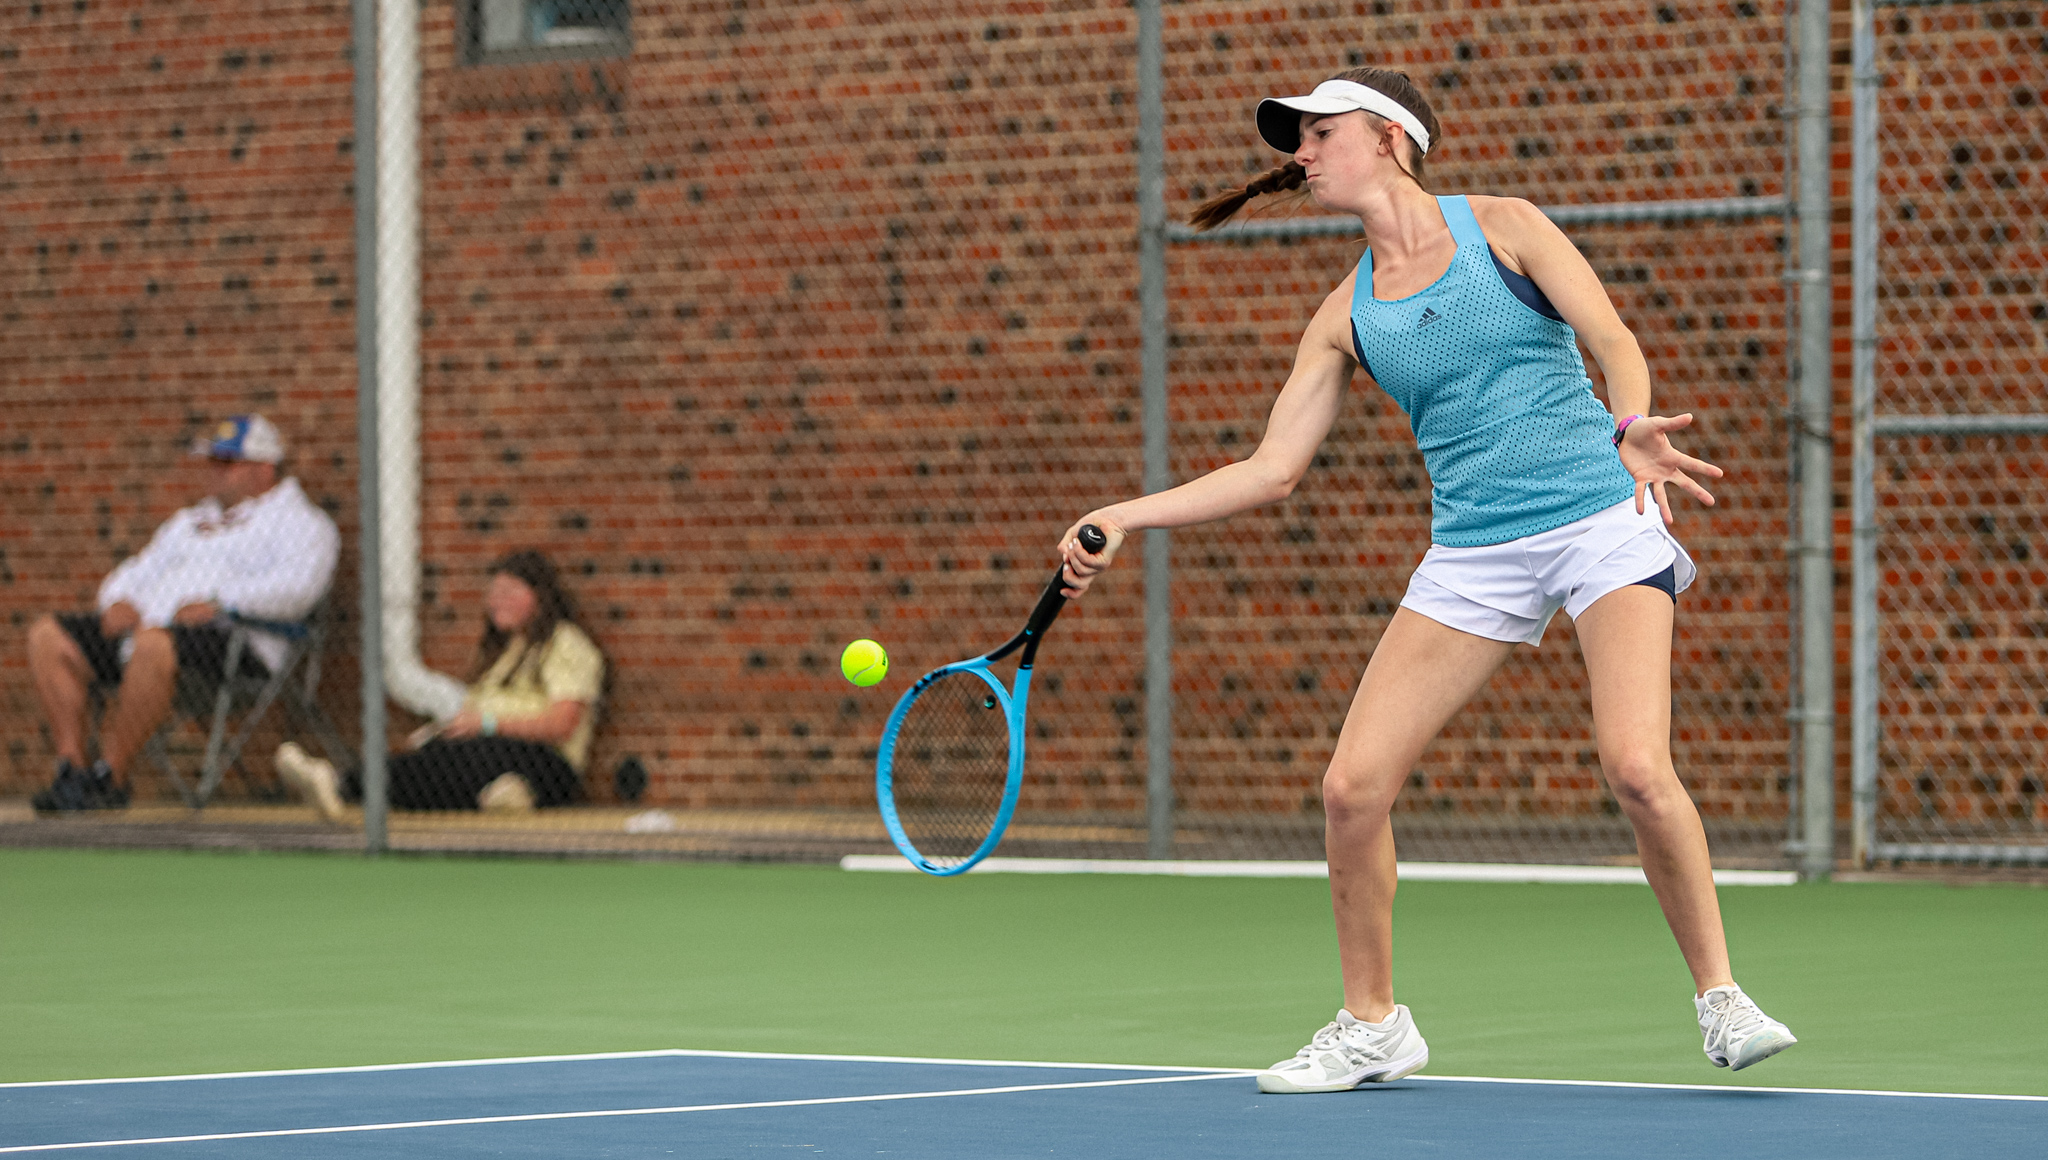 Athletes Of The Week: McKenzie Millard